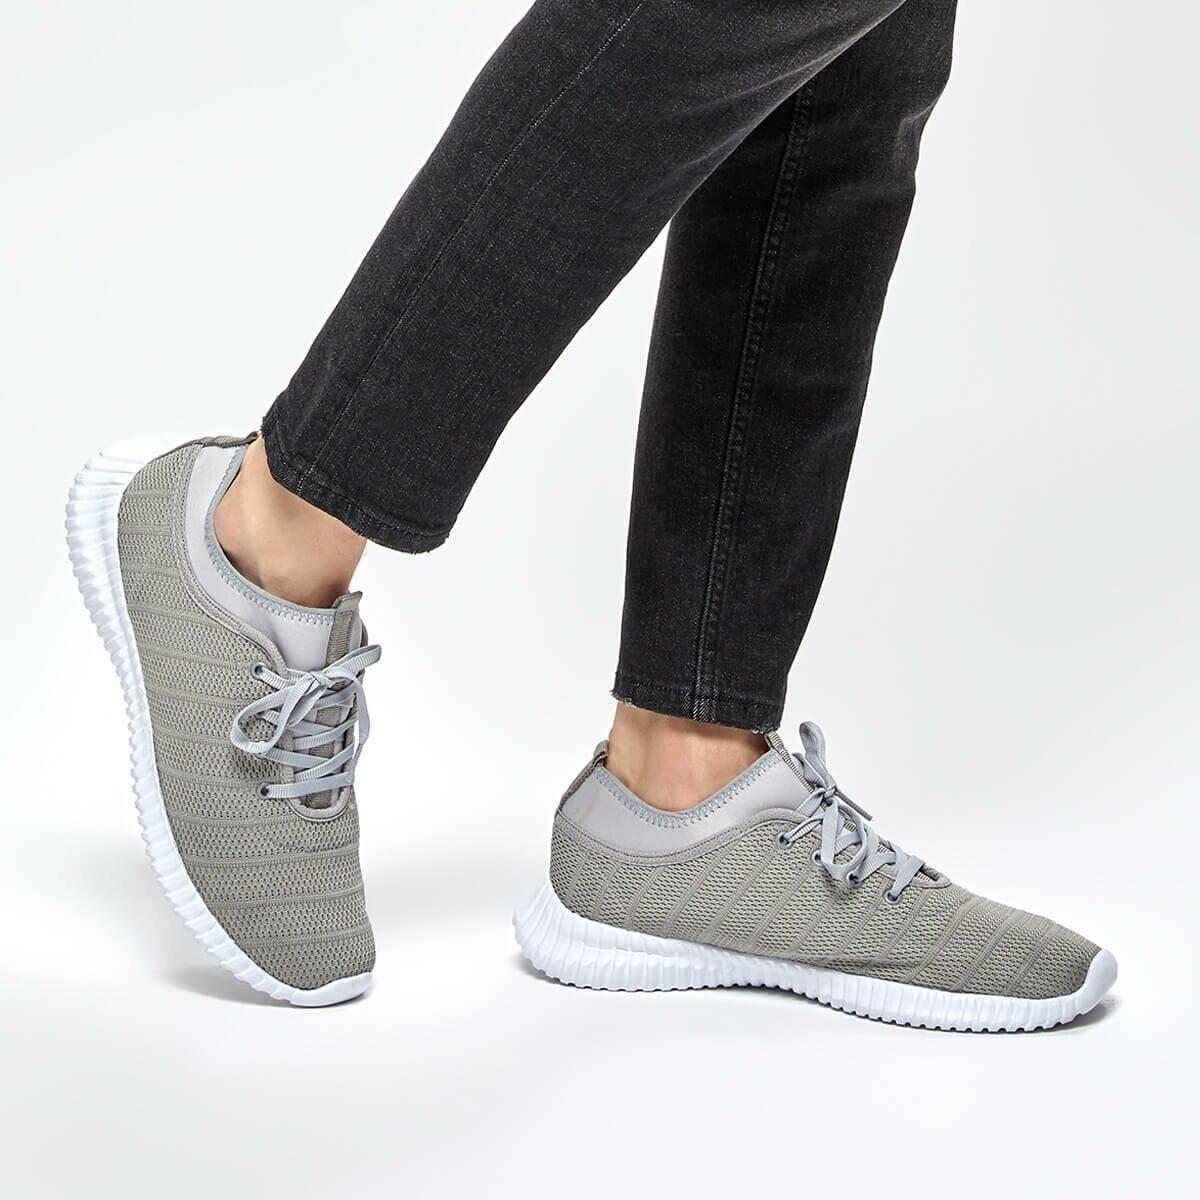 FLO EKL207 Gray Men Shoes Forester